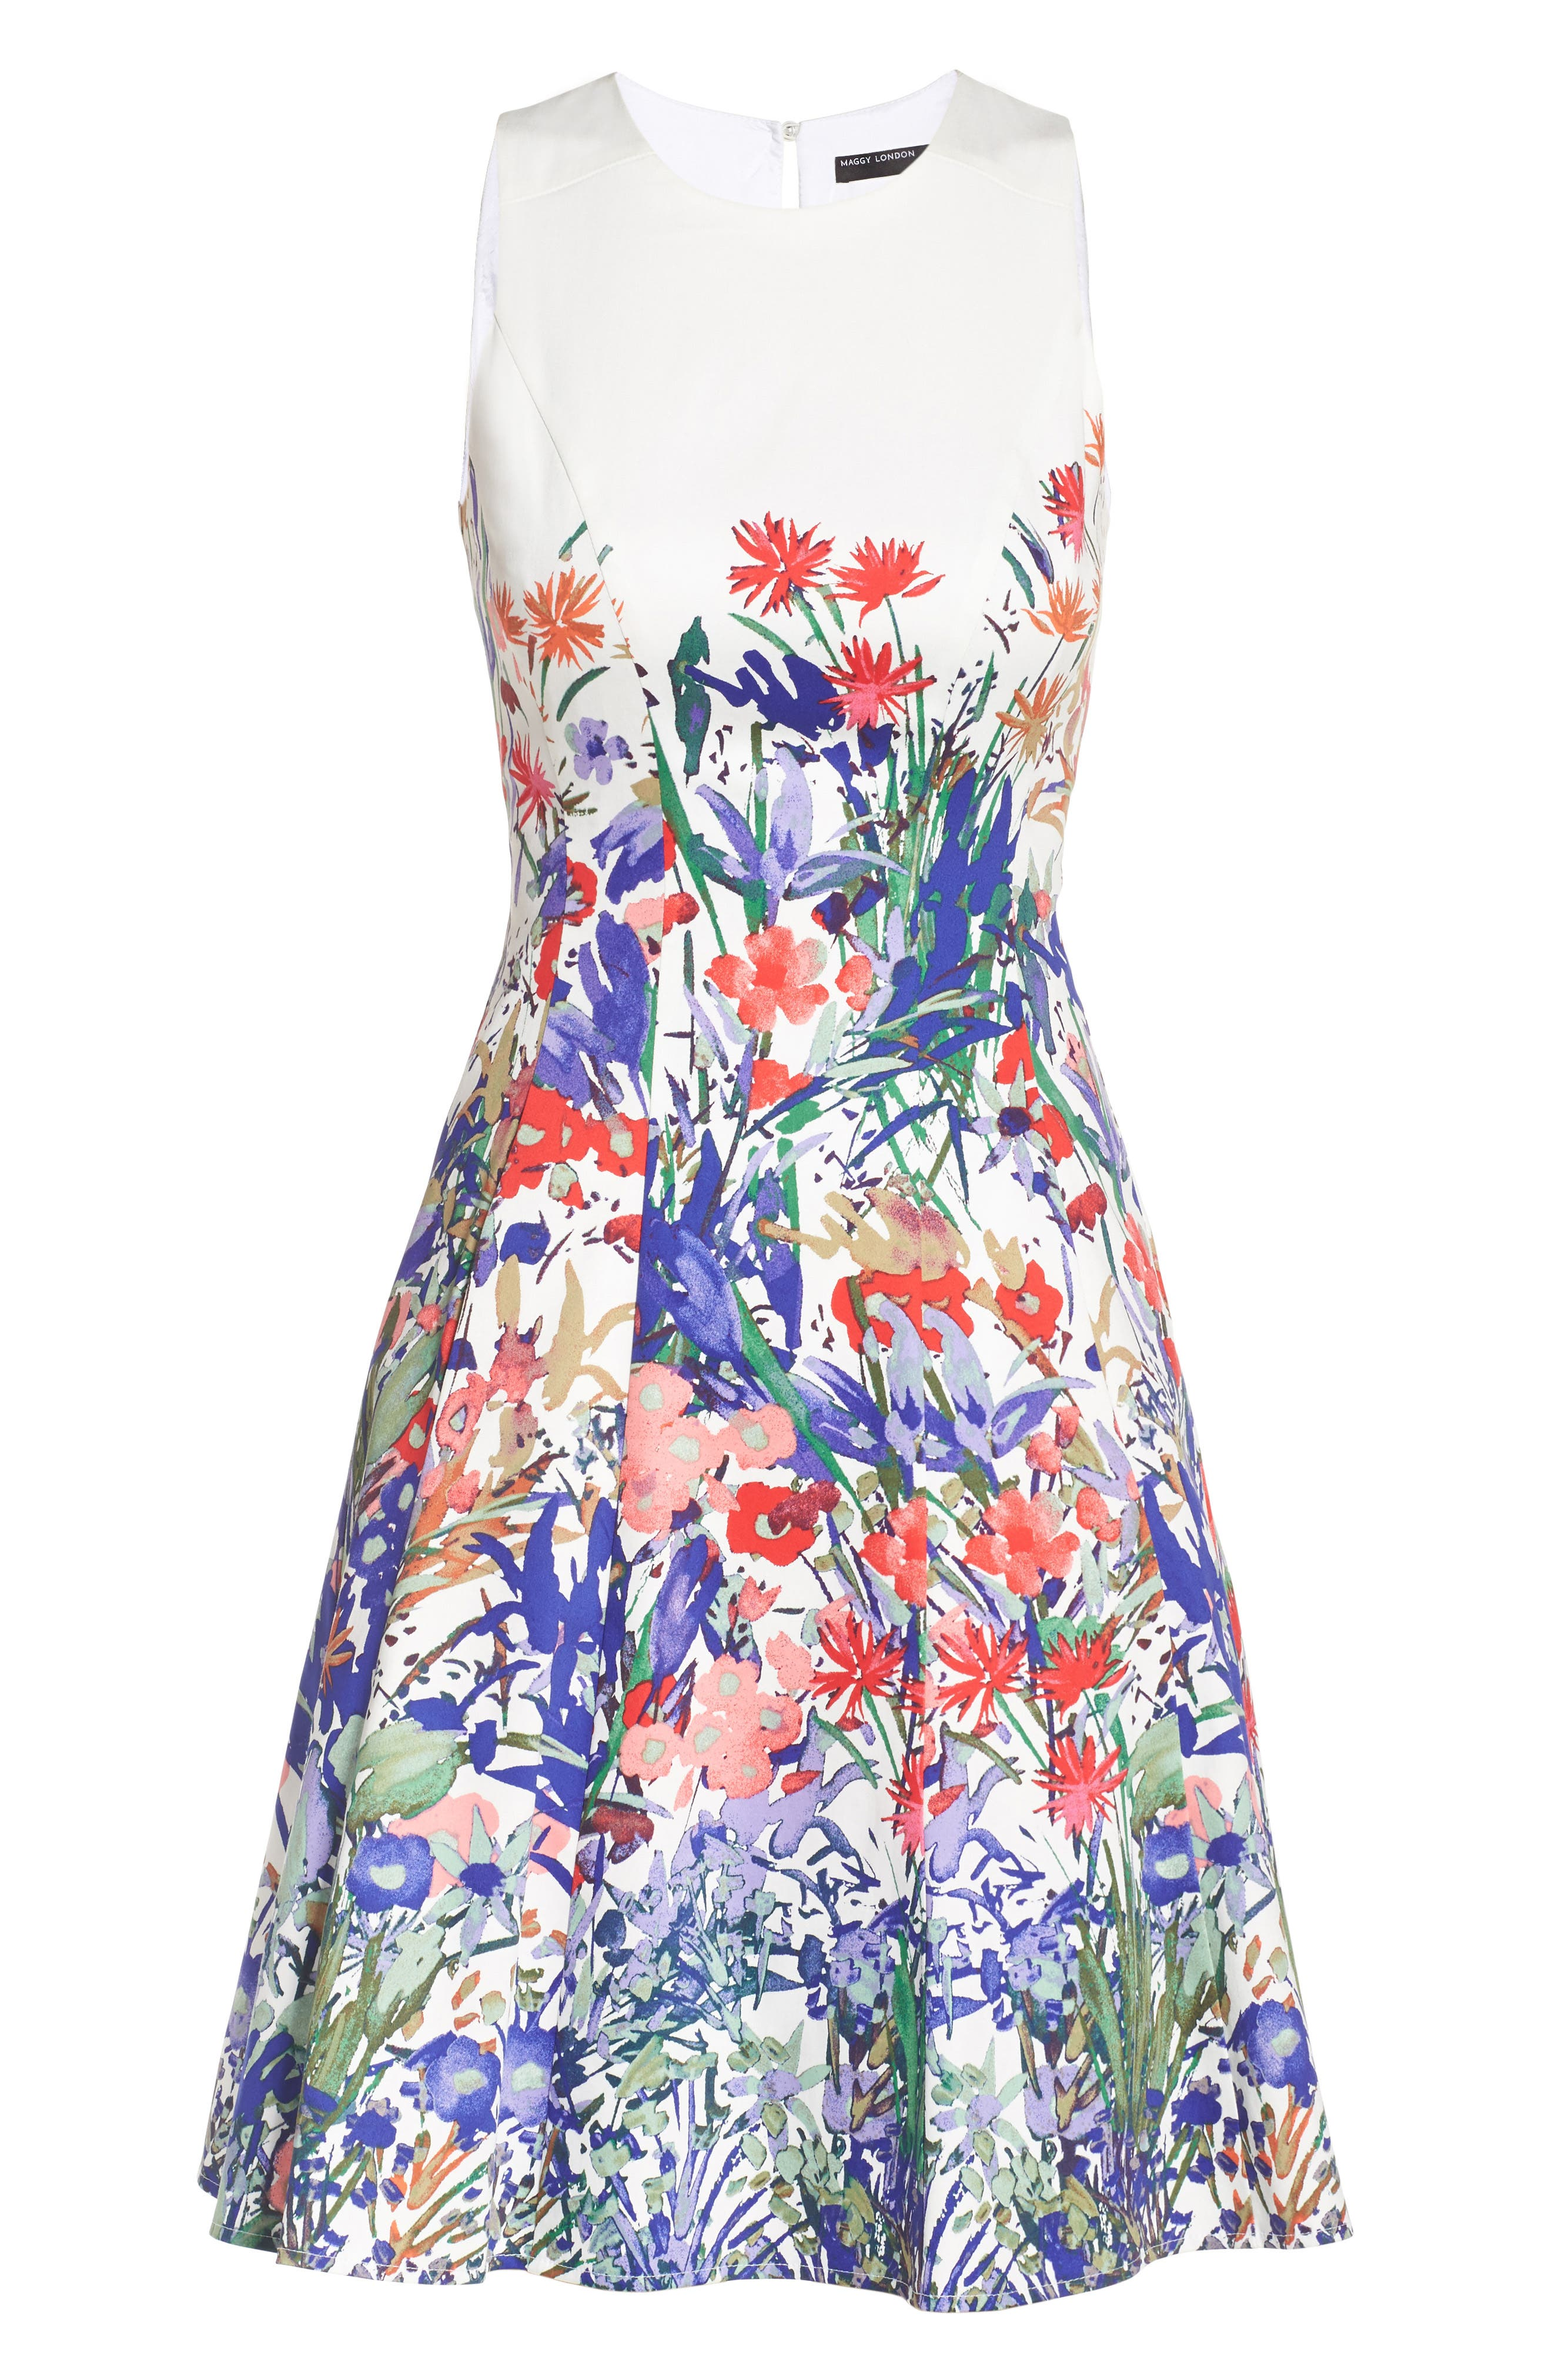 Cottage Garden Fit & Flare Dress,                             Alternate thumbnail 6, color,                             Soft White/ Coral/ Purple